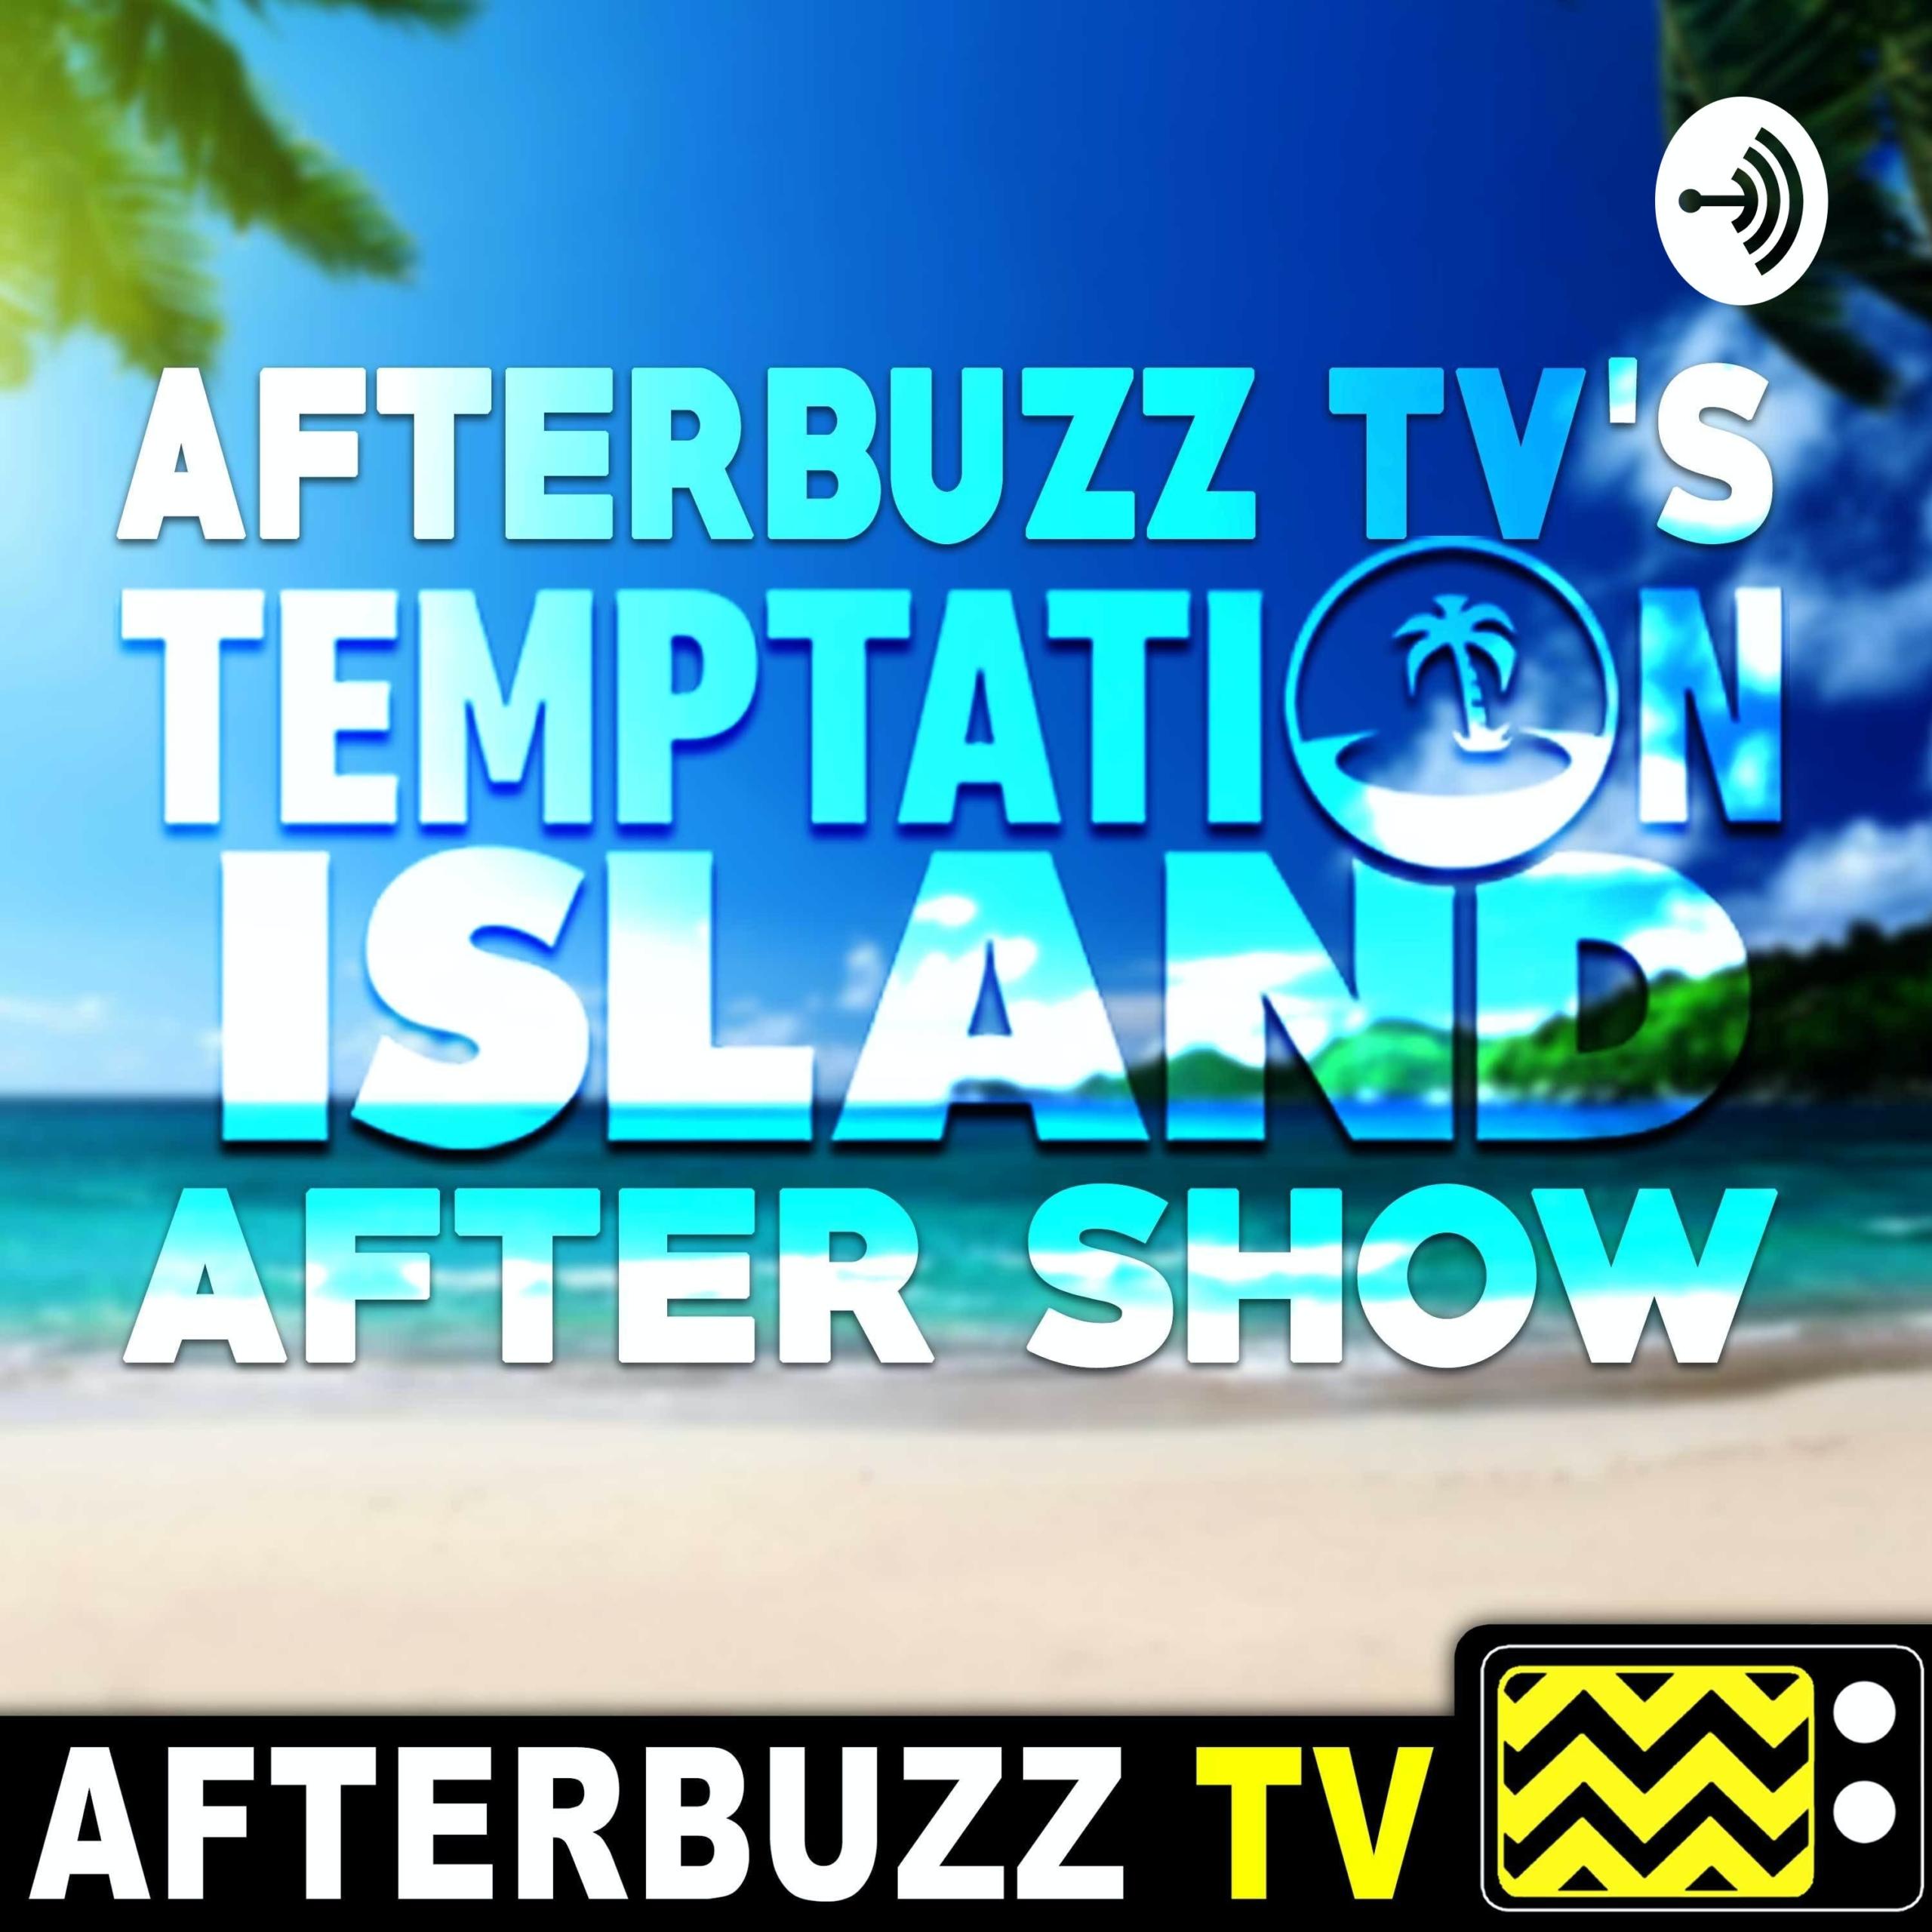 The Temptation Island Podcast